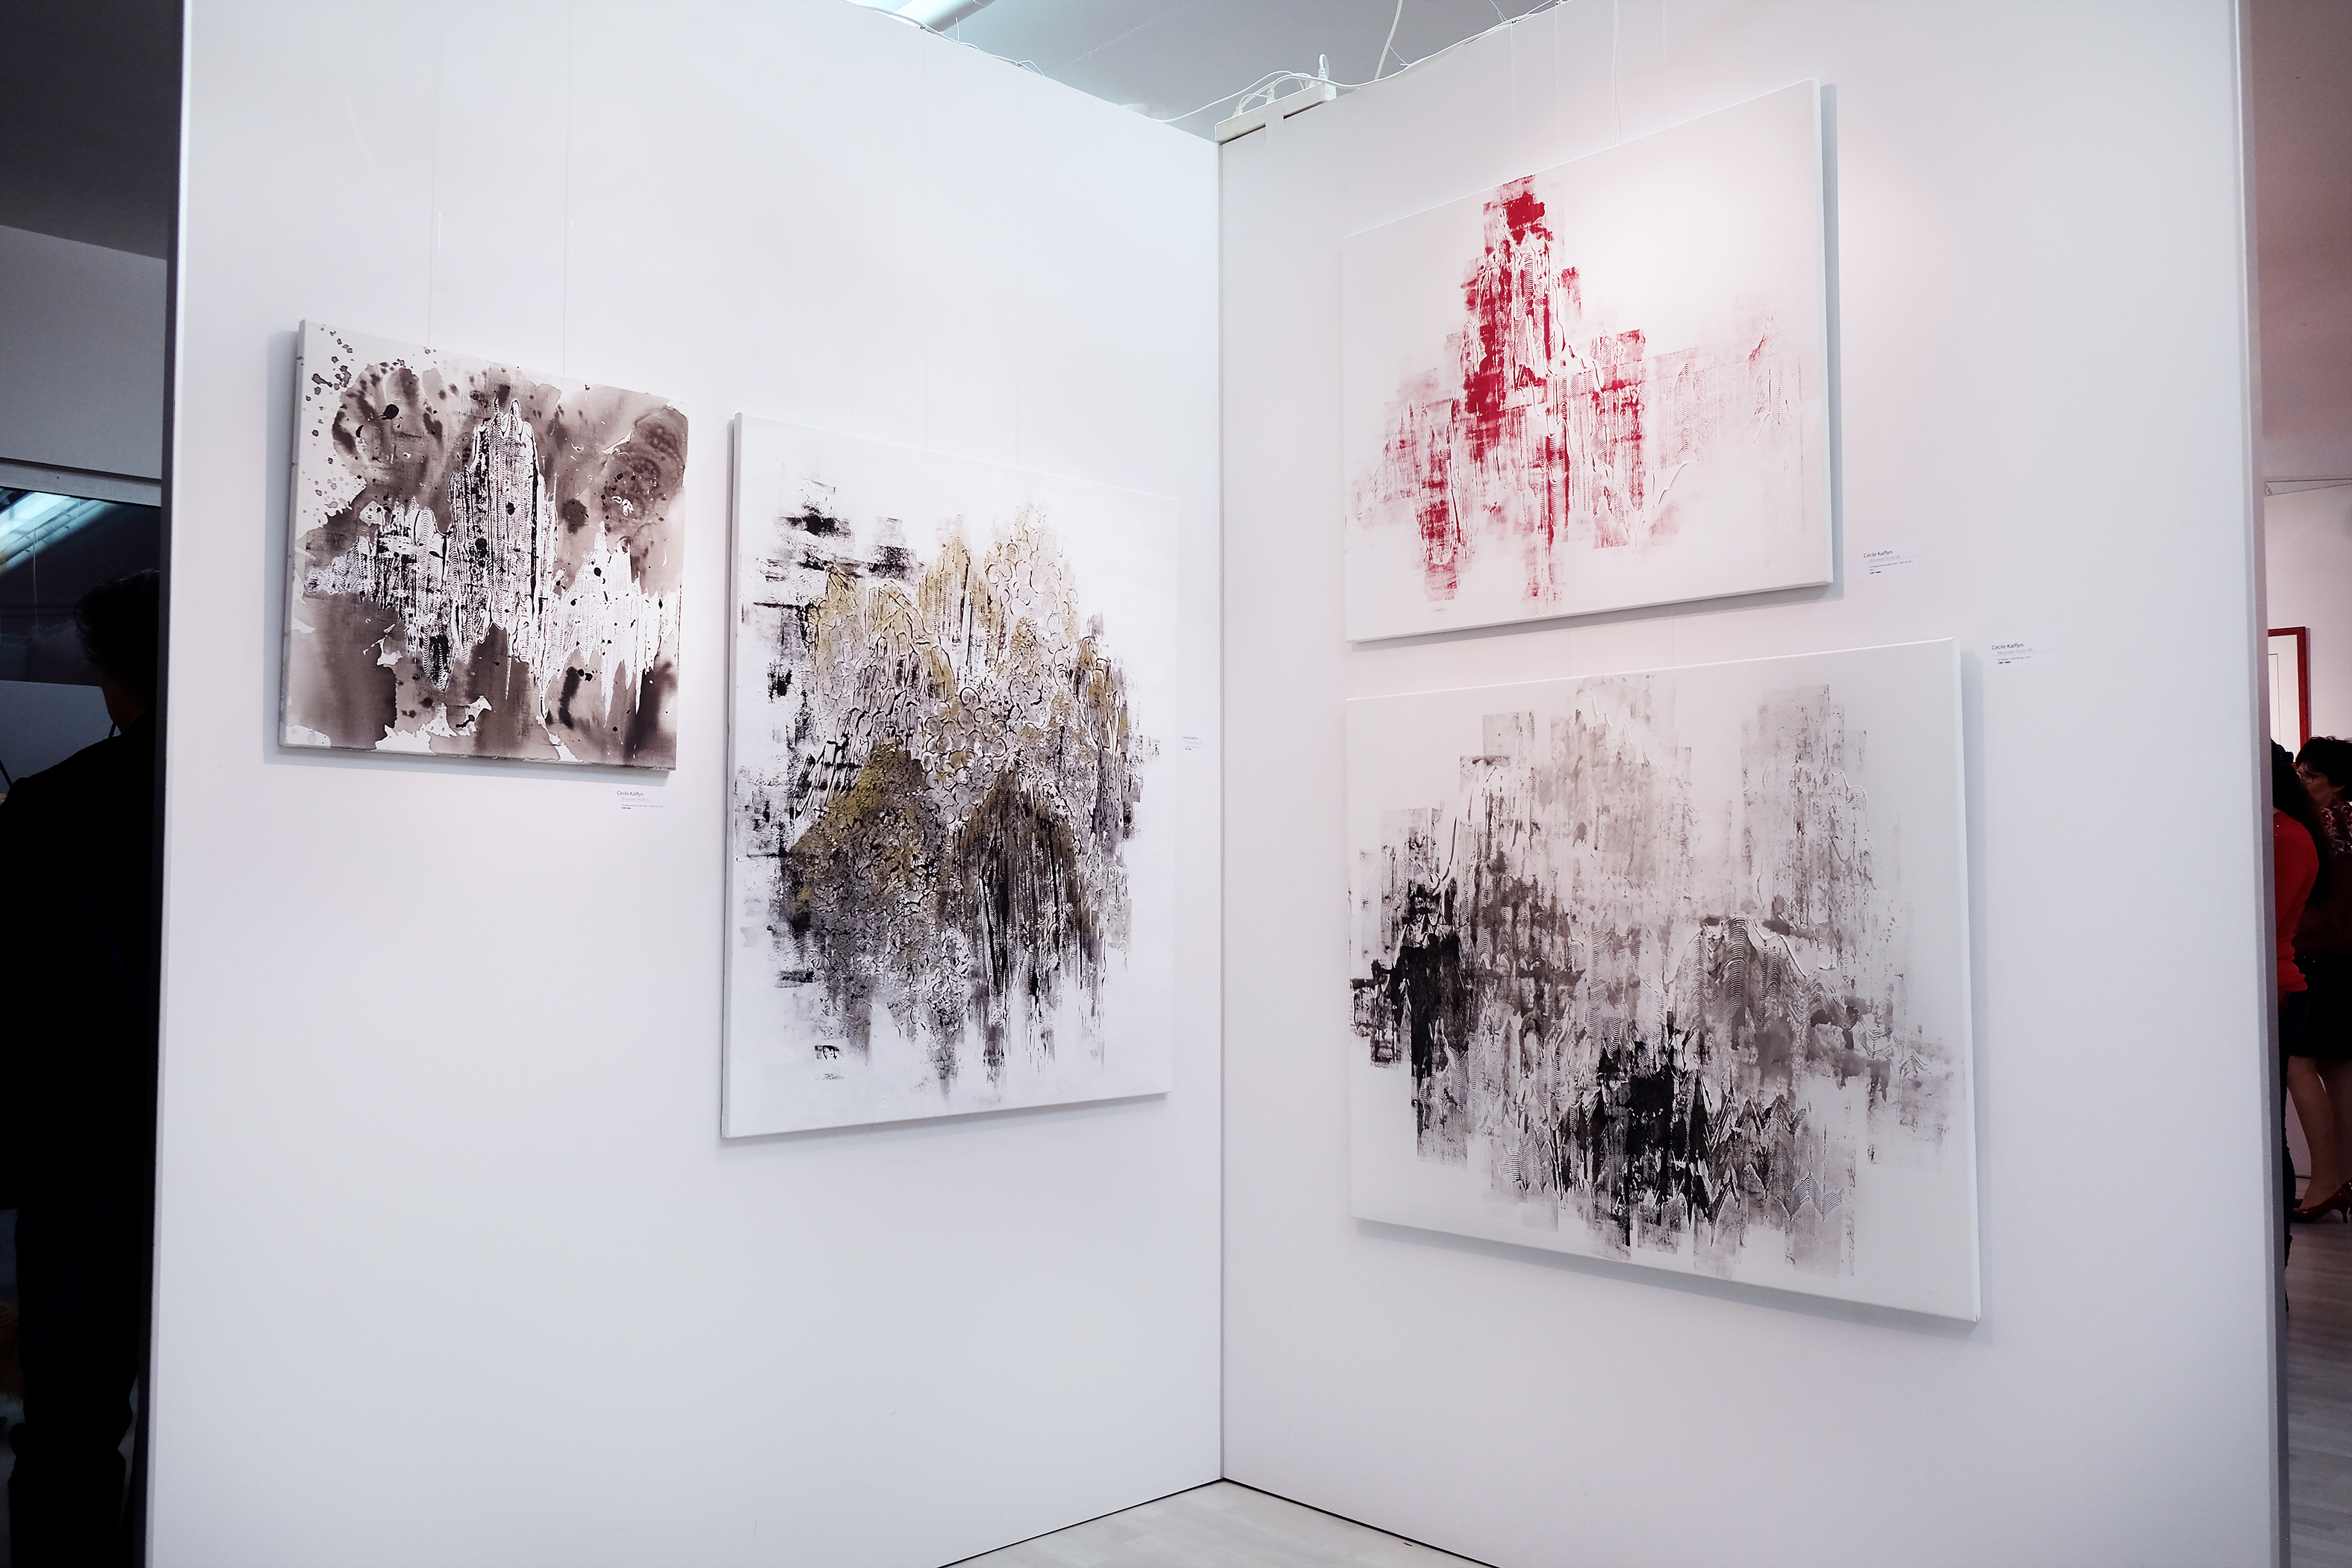 Exhibition Hiver 2018